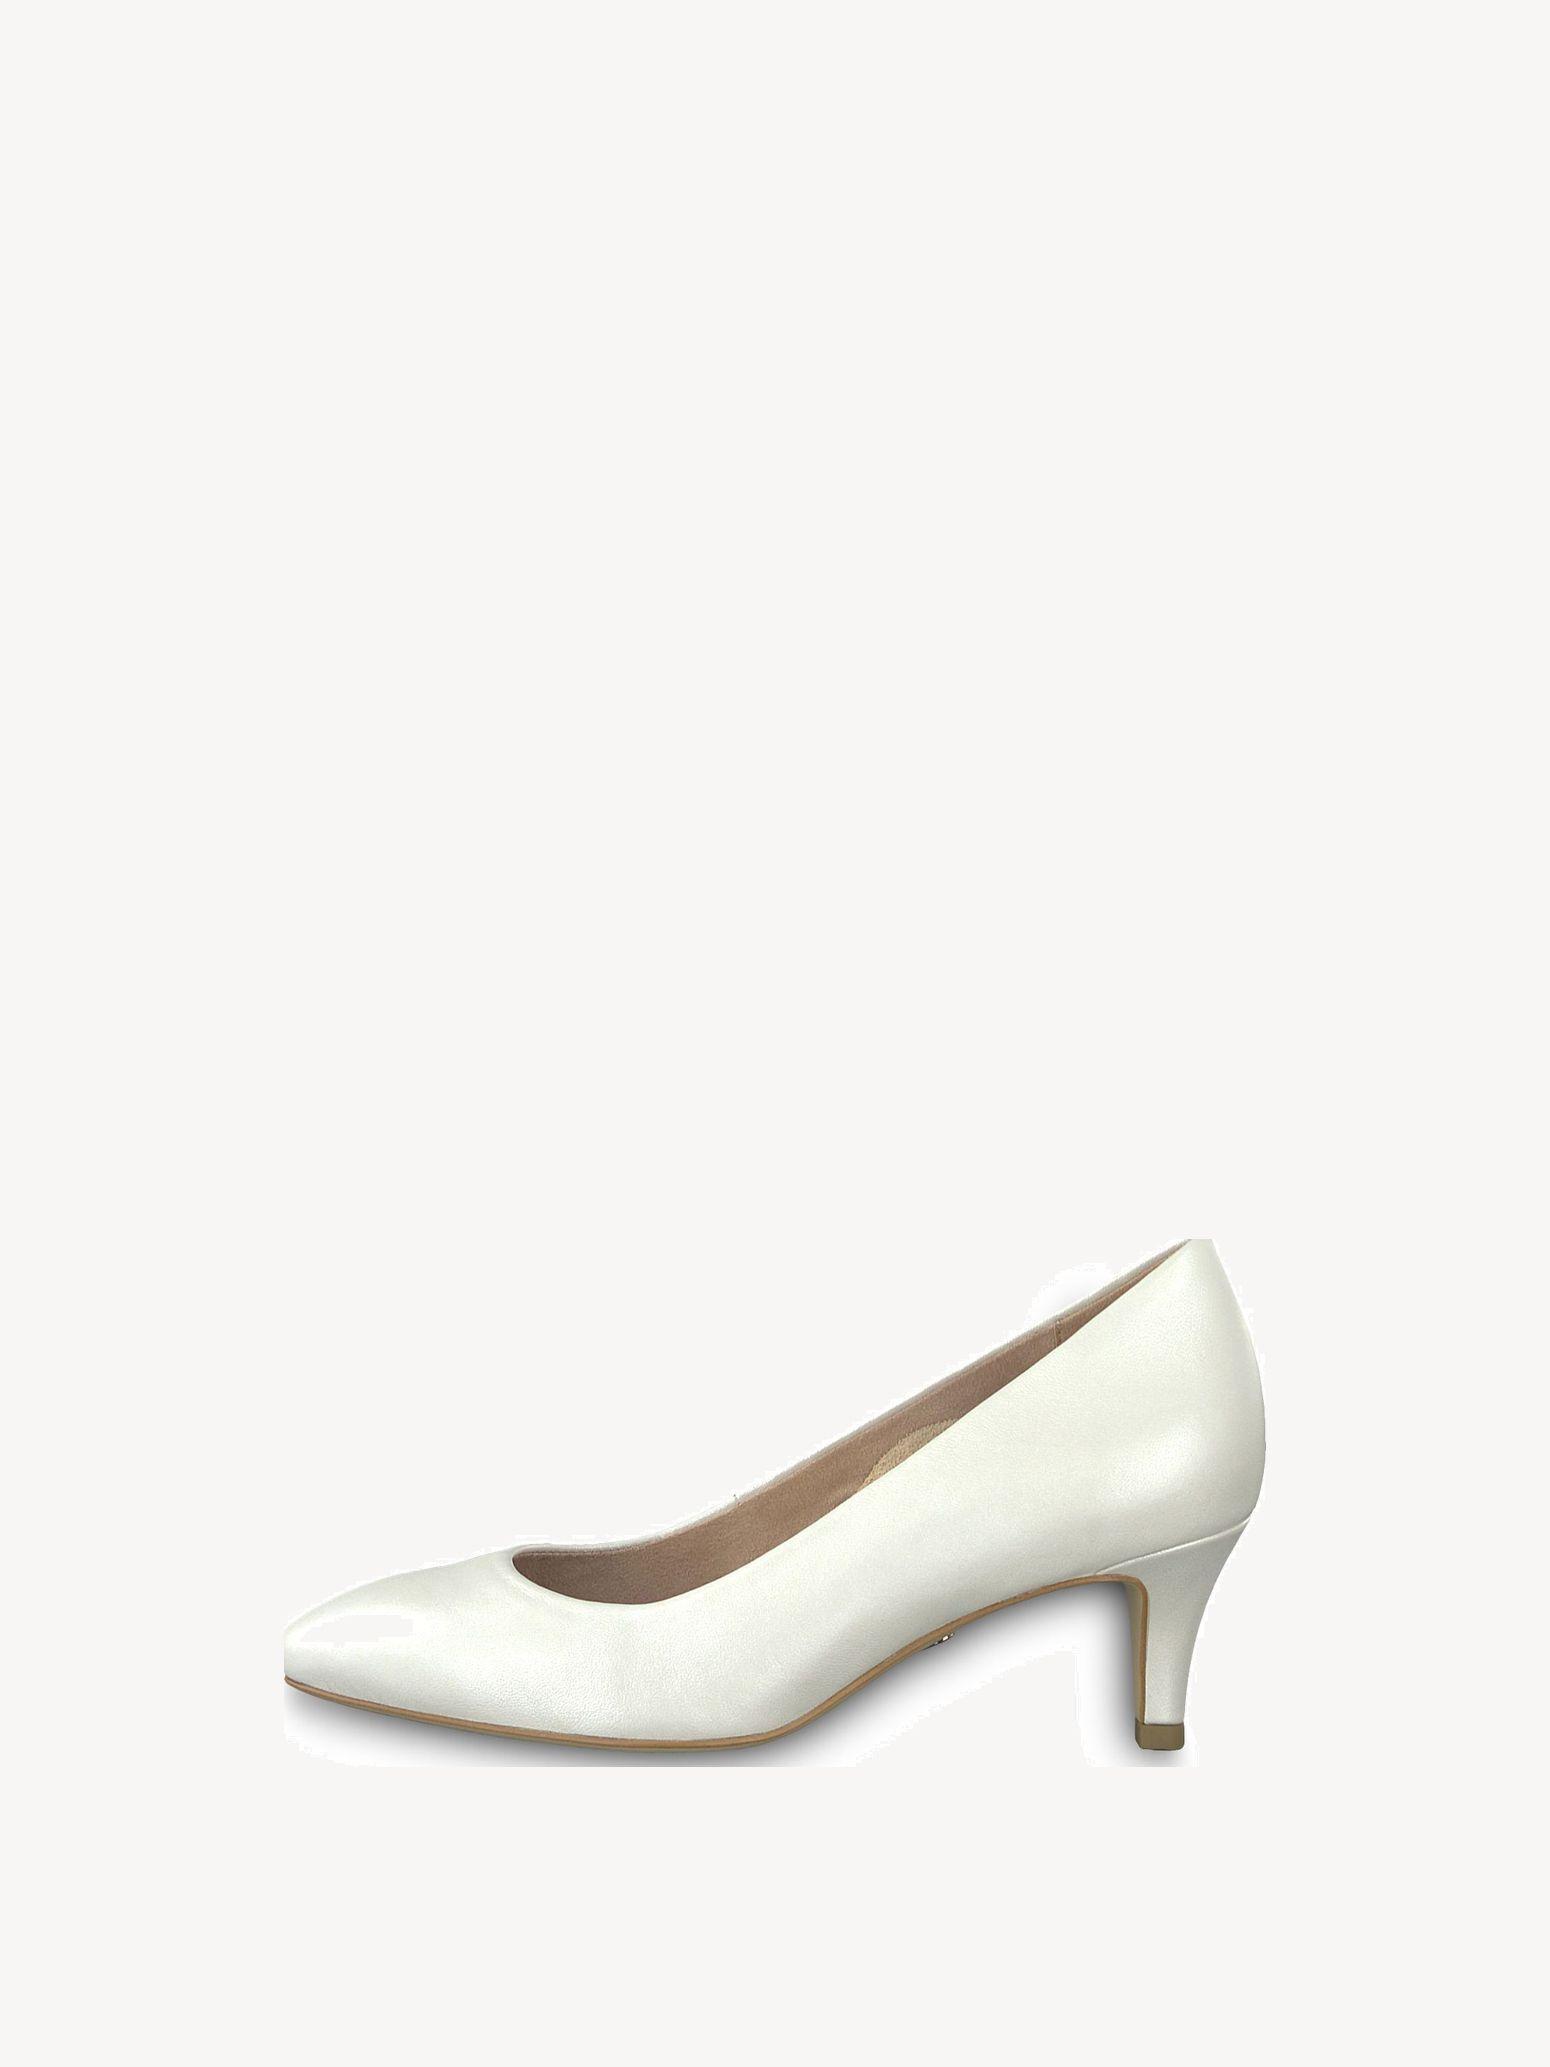 22116, Escarpins Femme, Blanc (White Leather), 43 EUTamaris